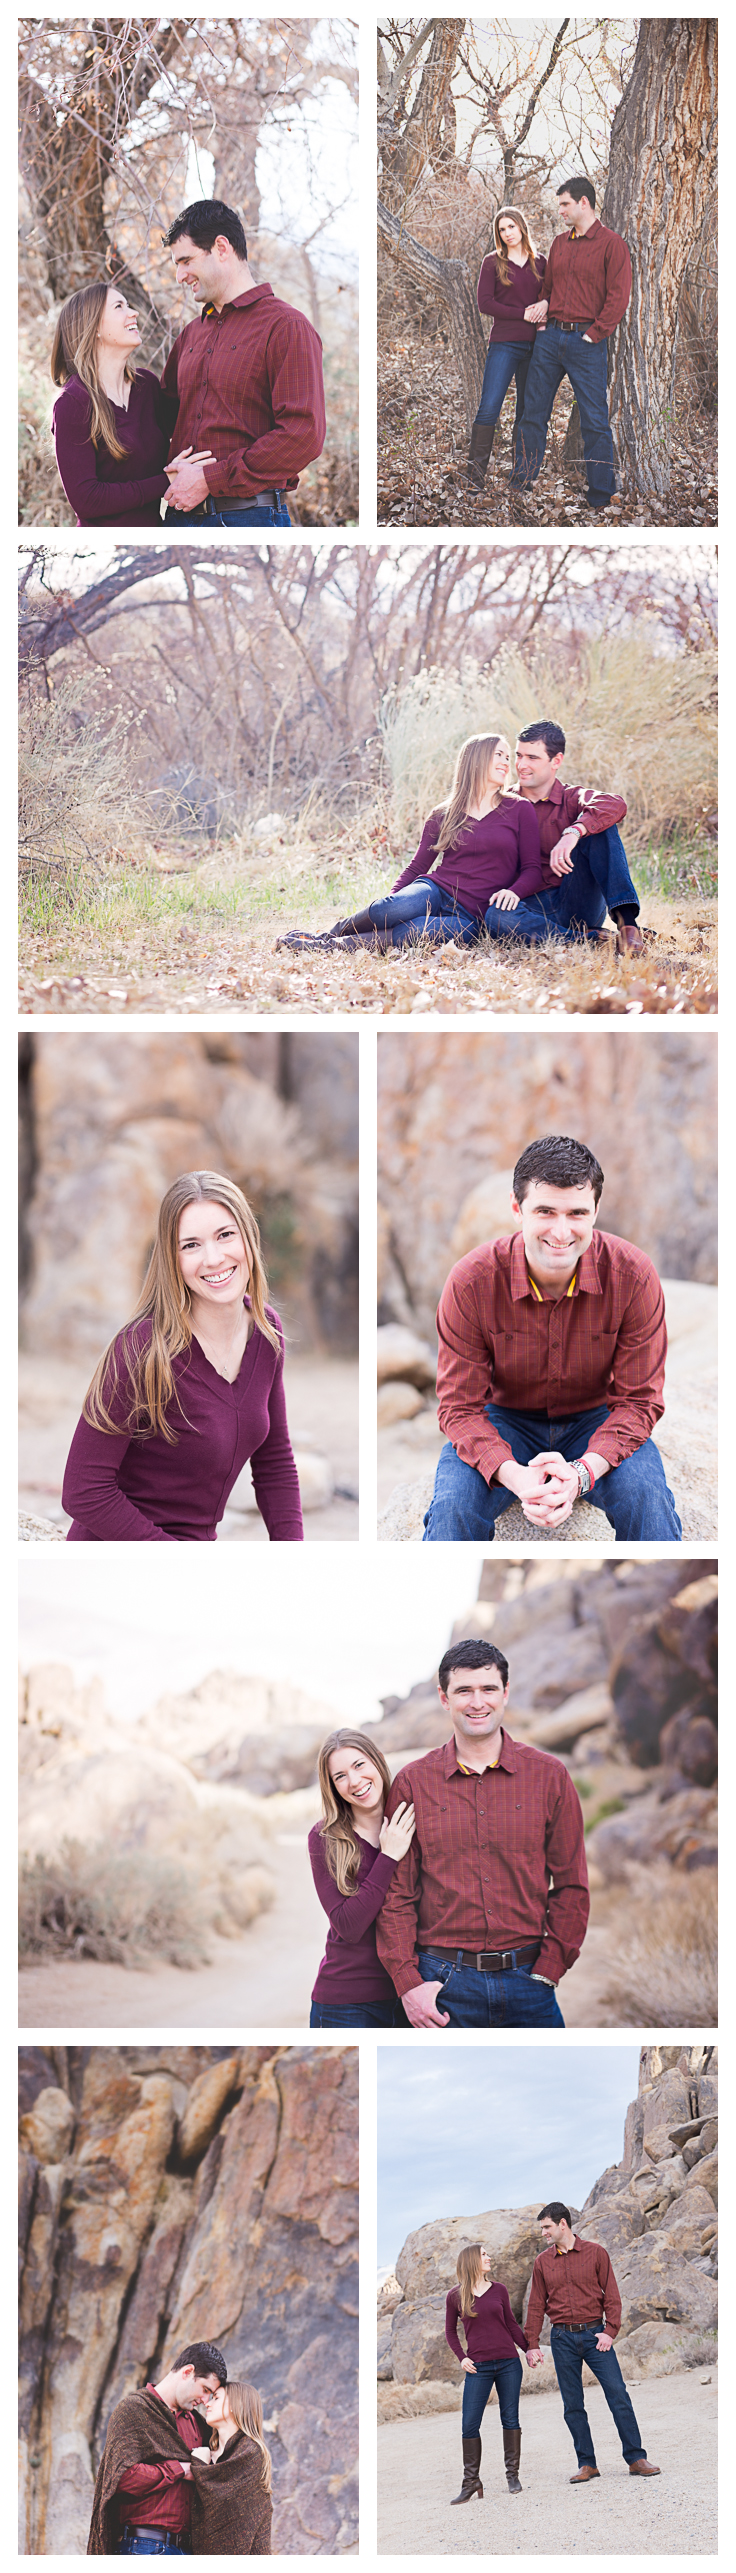 Grauke_RidgecrestPhotography.jpg